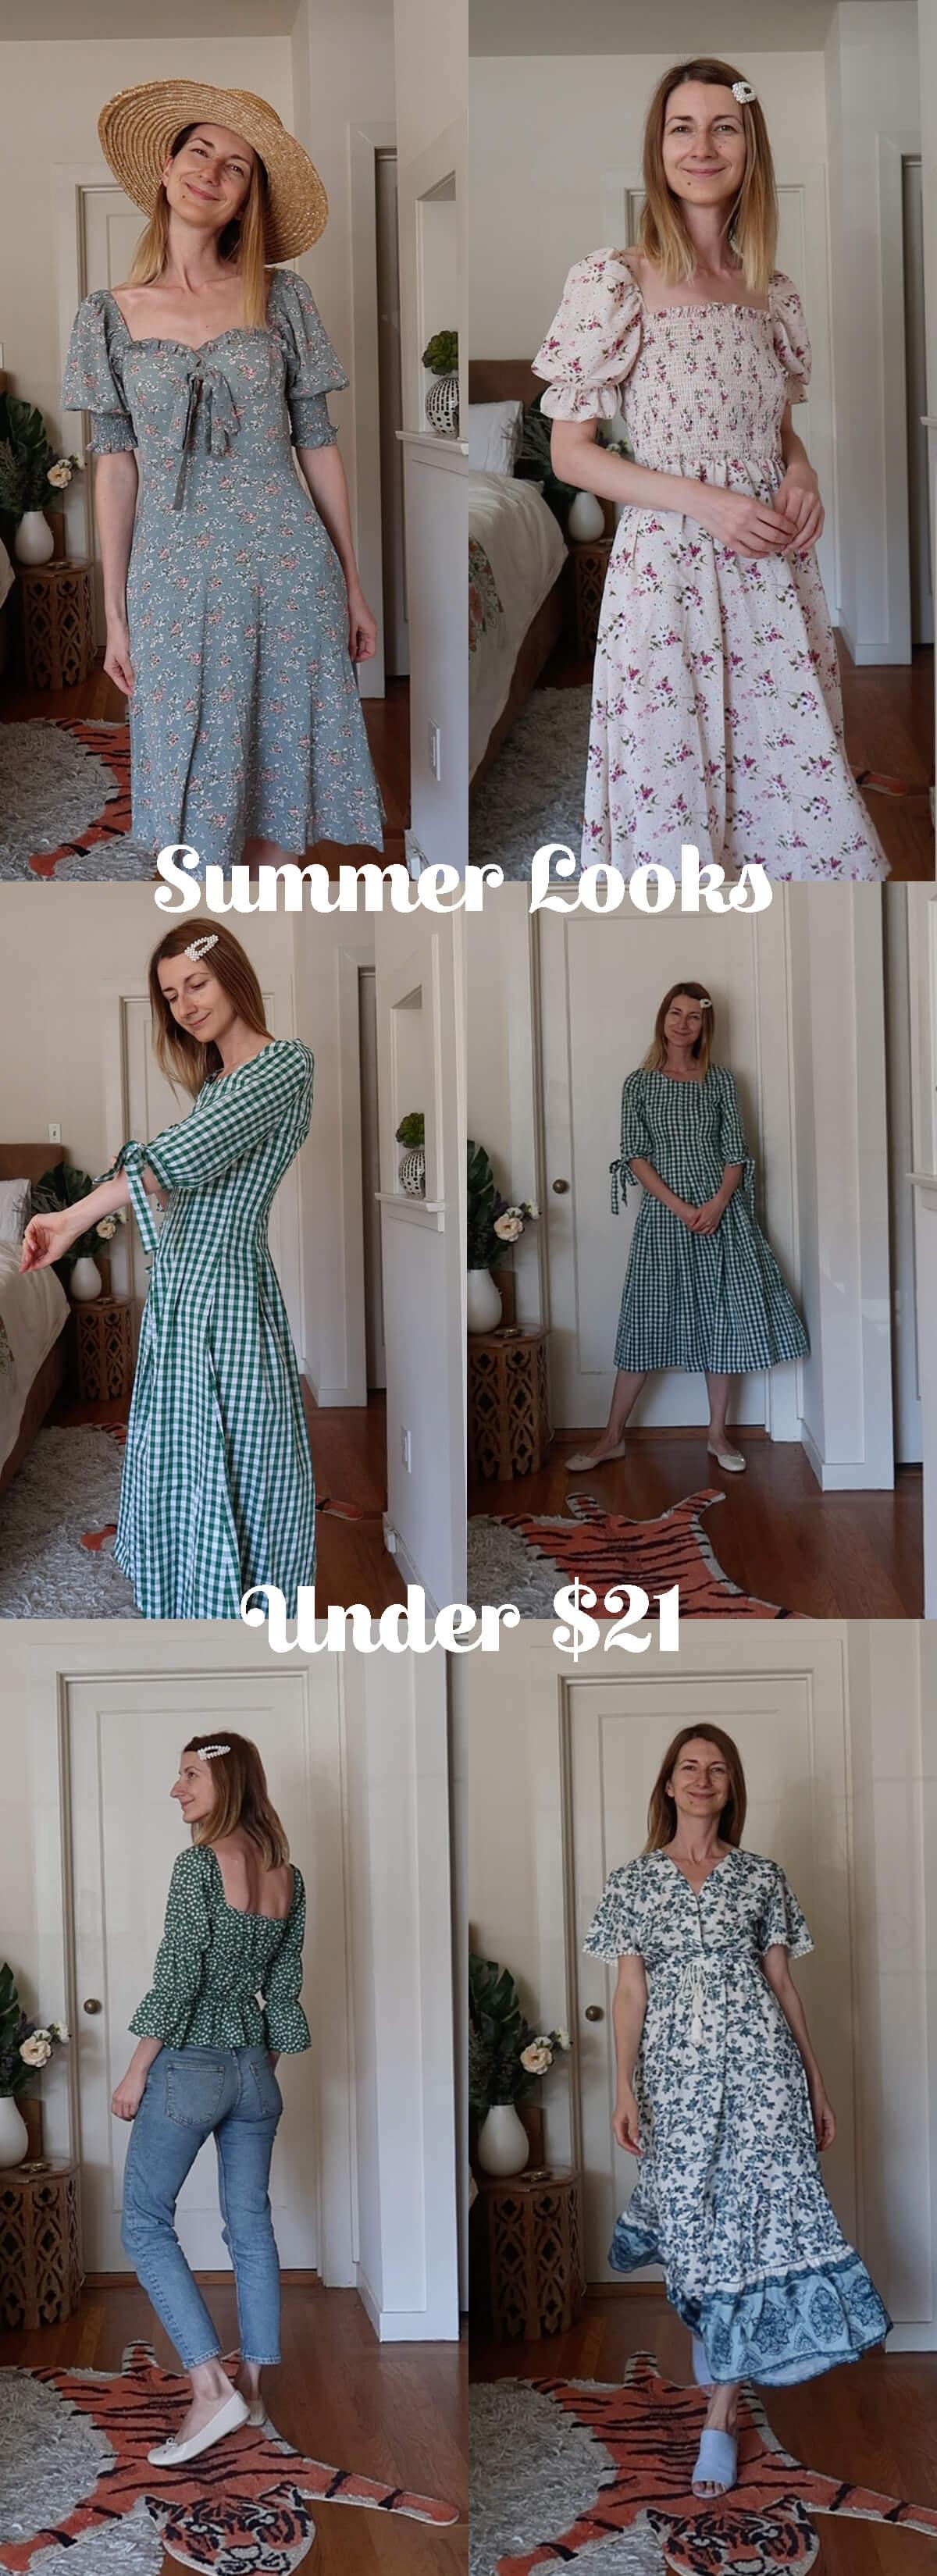 SHEIN-shoppingHaul.jpg